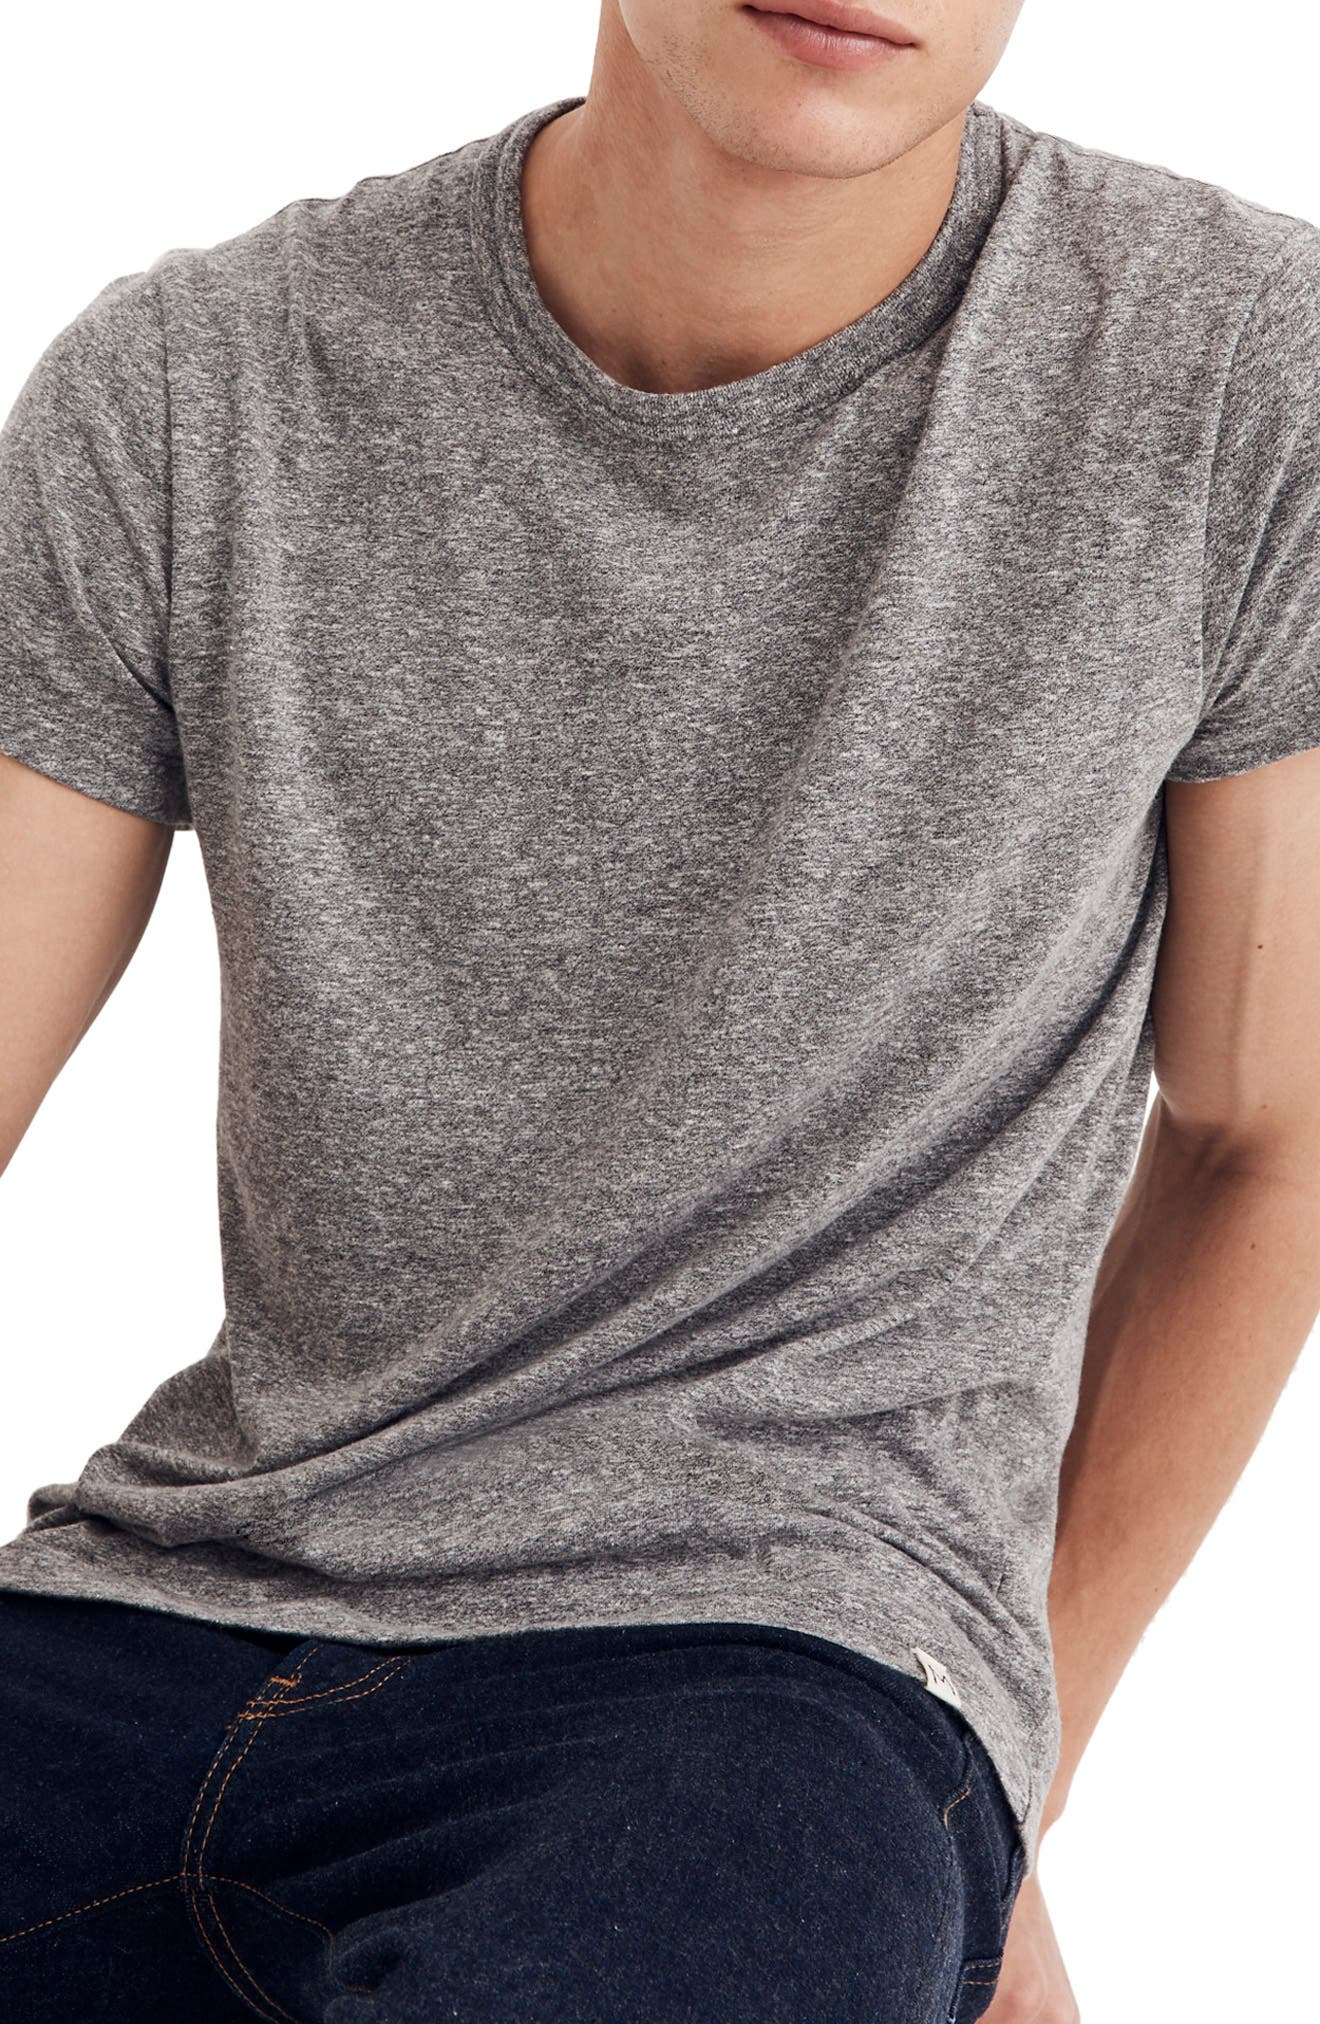 MADEWELL,                             Crewneck T-Shirt,                             Main thumbnail 1, color,                             HEATHER GREY